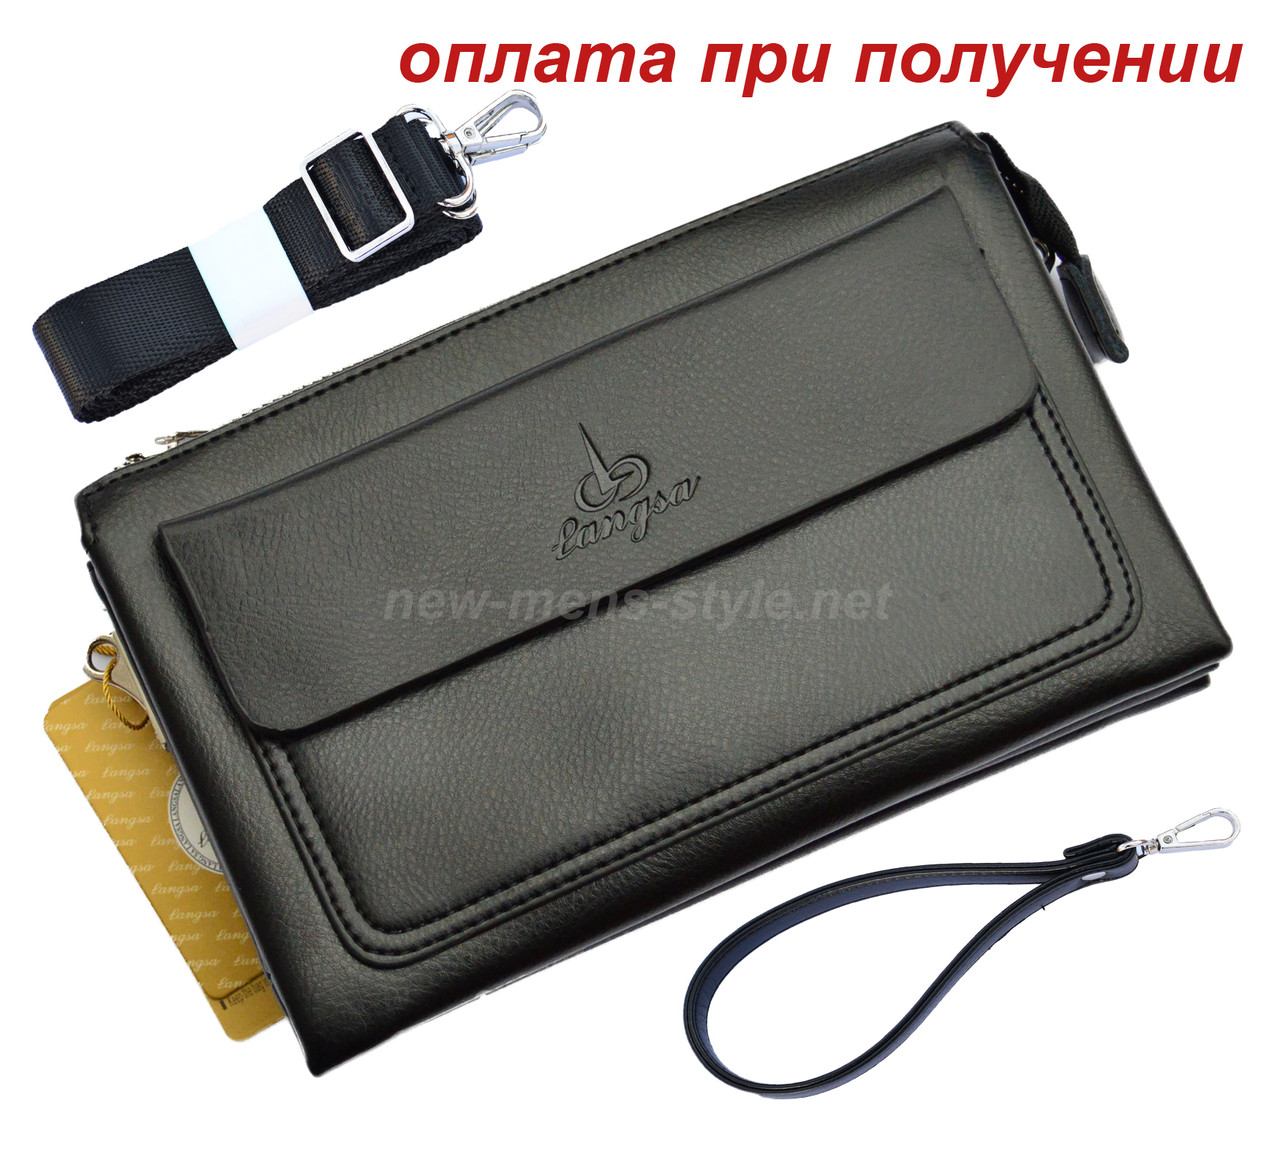 Чоловіча шкіряна натуральна сумка барсетка барсетка клатч Langsla NEW